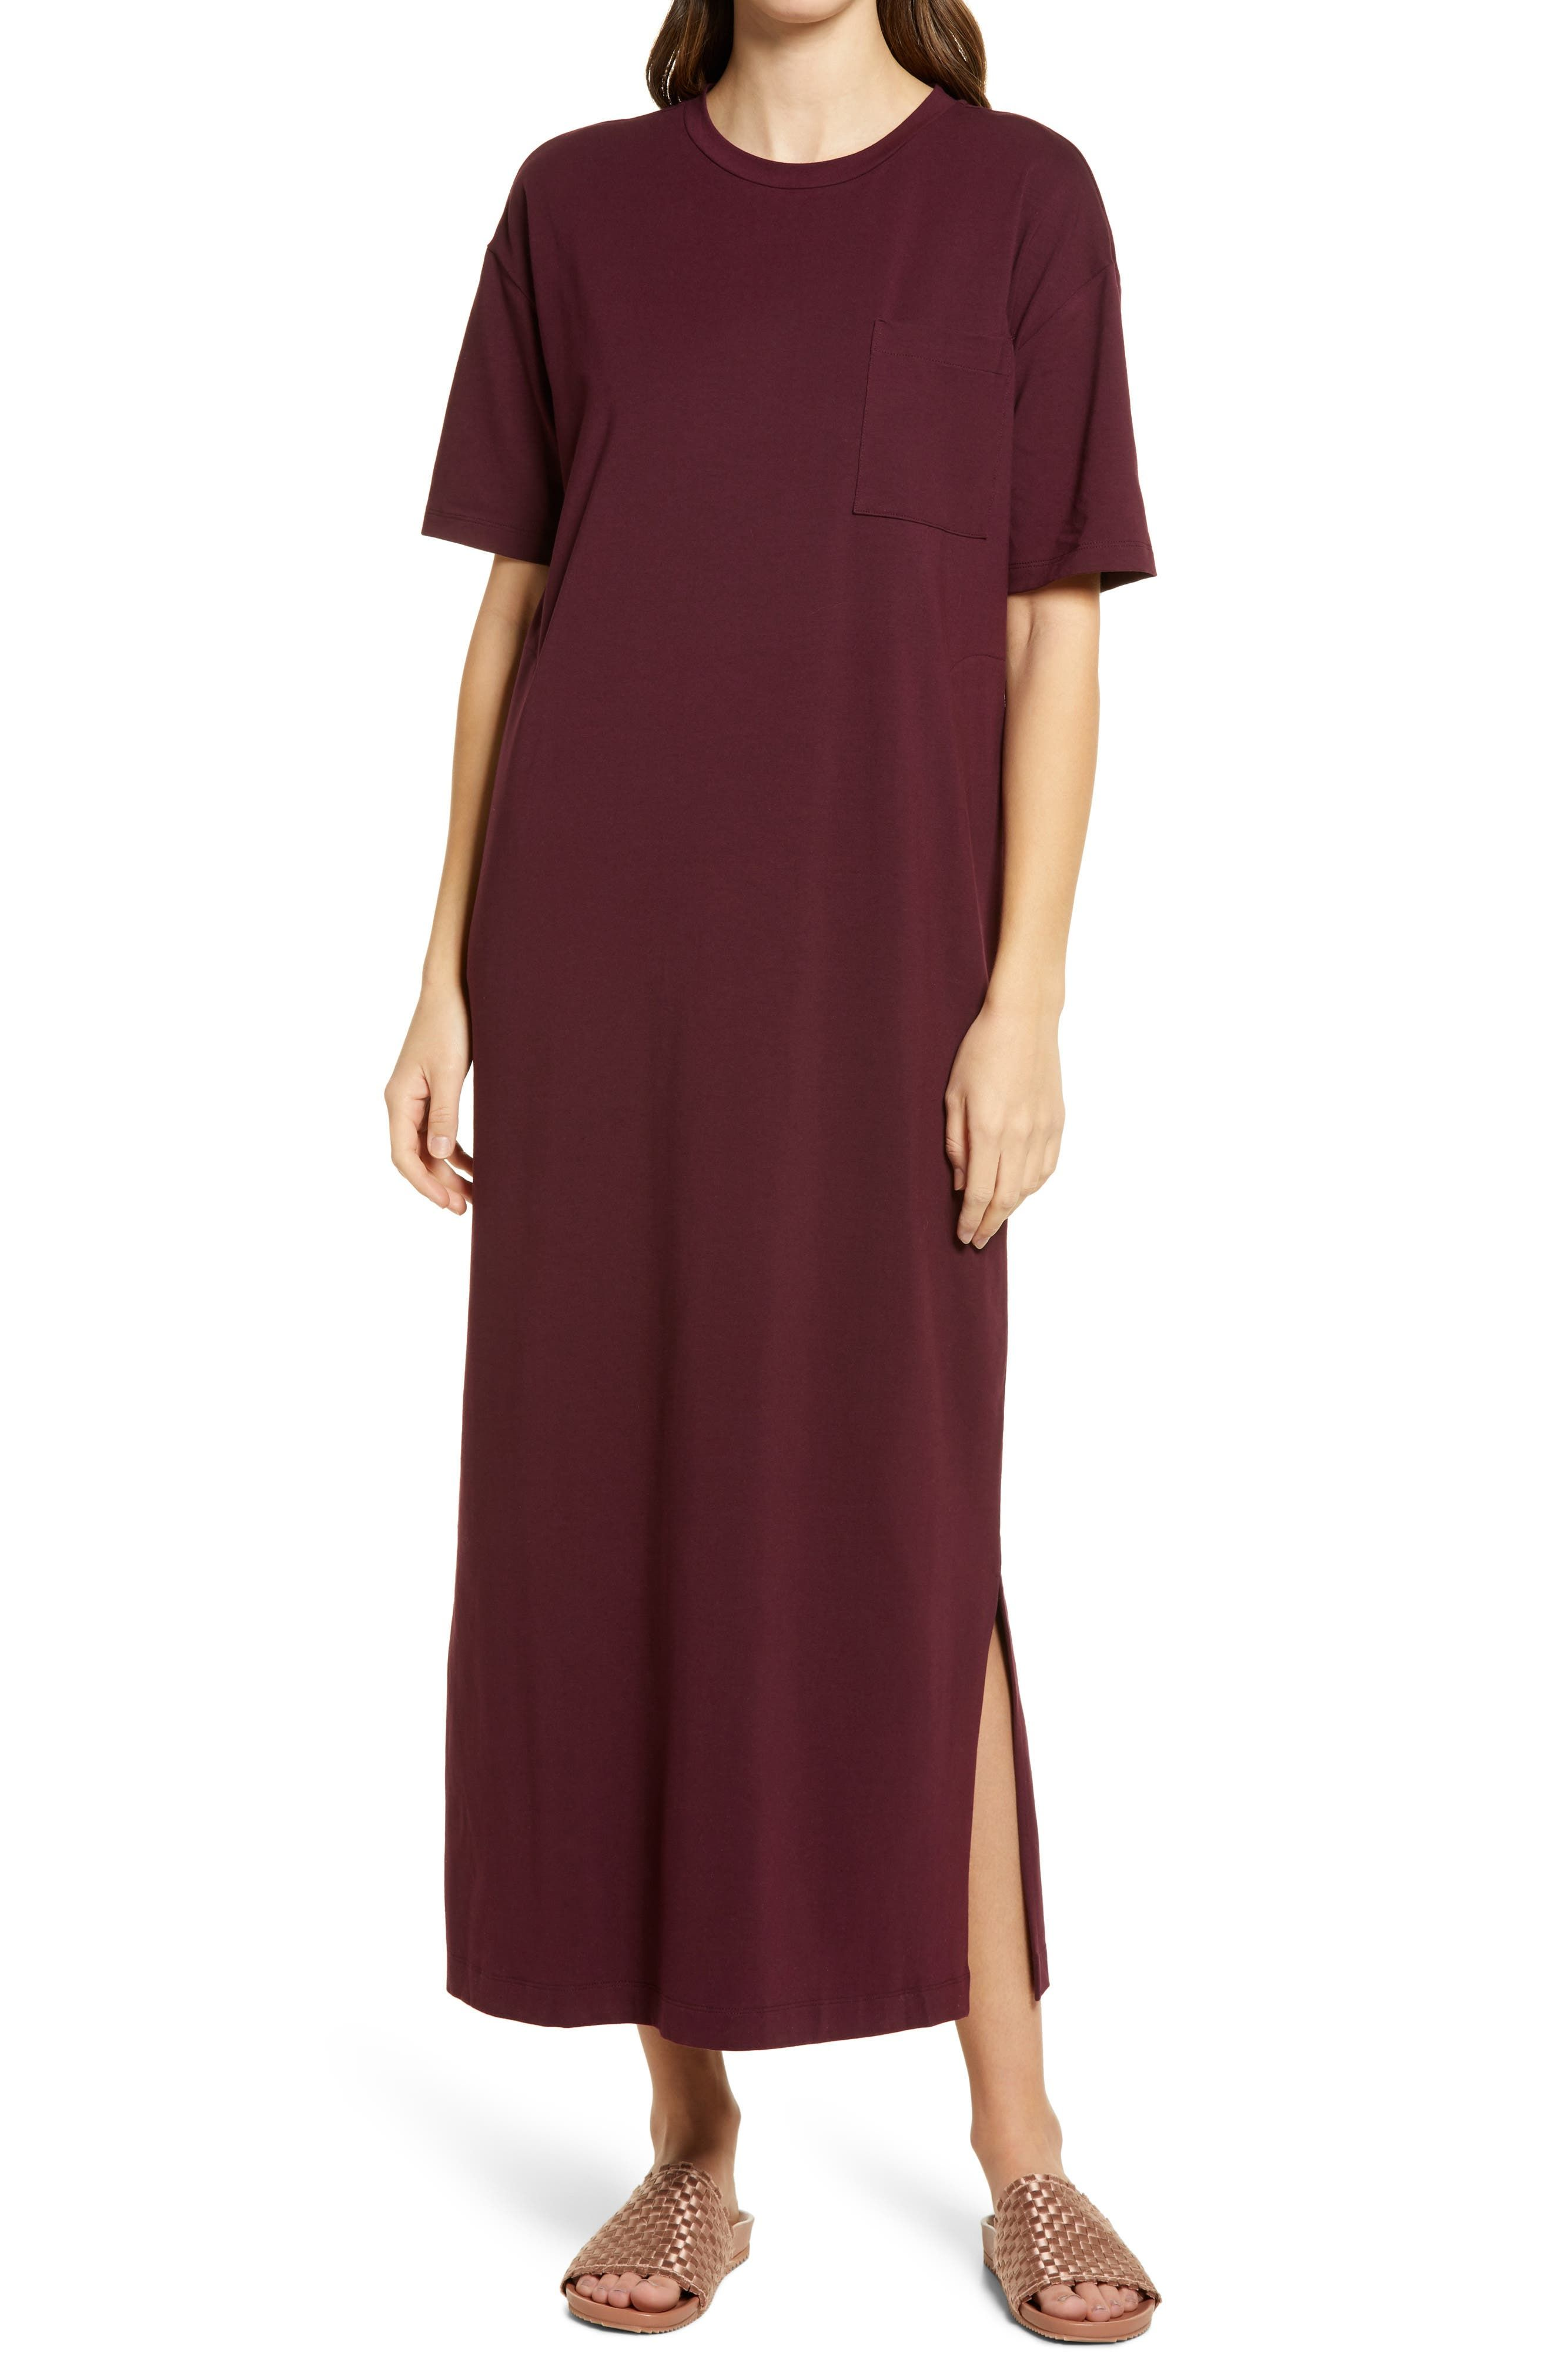 Nordstrom T Shirt Maxi Dress Nordstrom In 2021 Maxi Shirt Dress Maxi Dress Cotton Maxi [ 4048 x 2640 Pixel ]